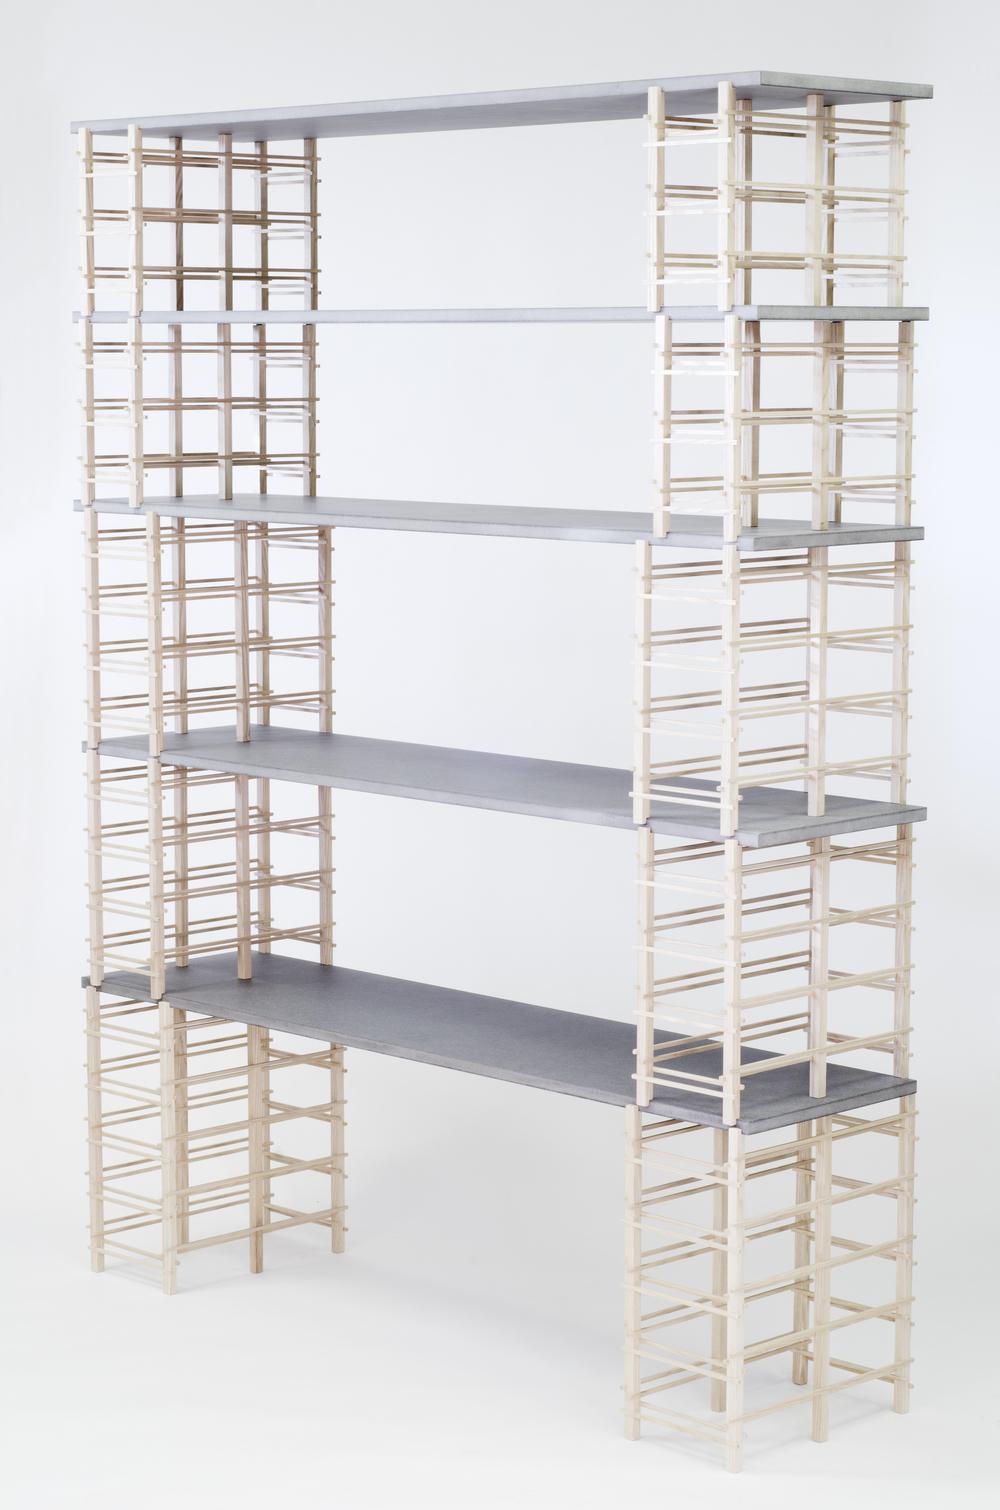 Scaffold by Charlie Styrbjörn Nilsson  (9).JPG